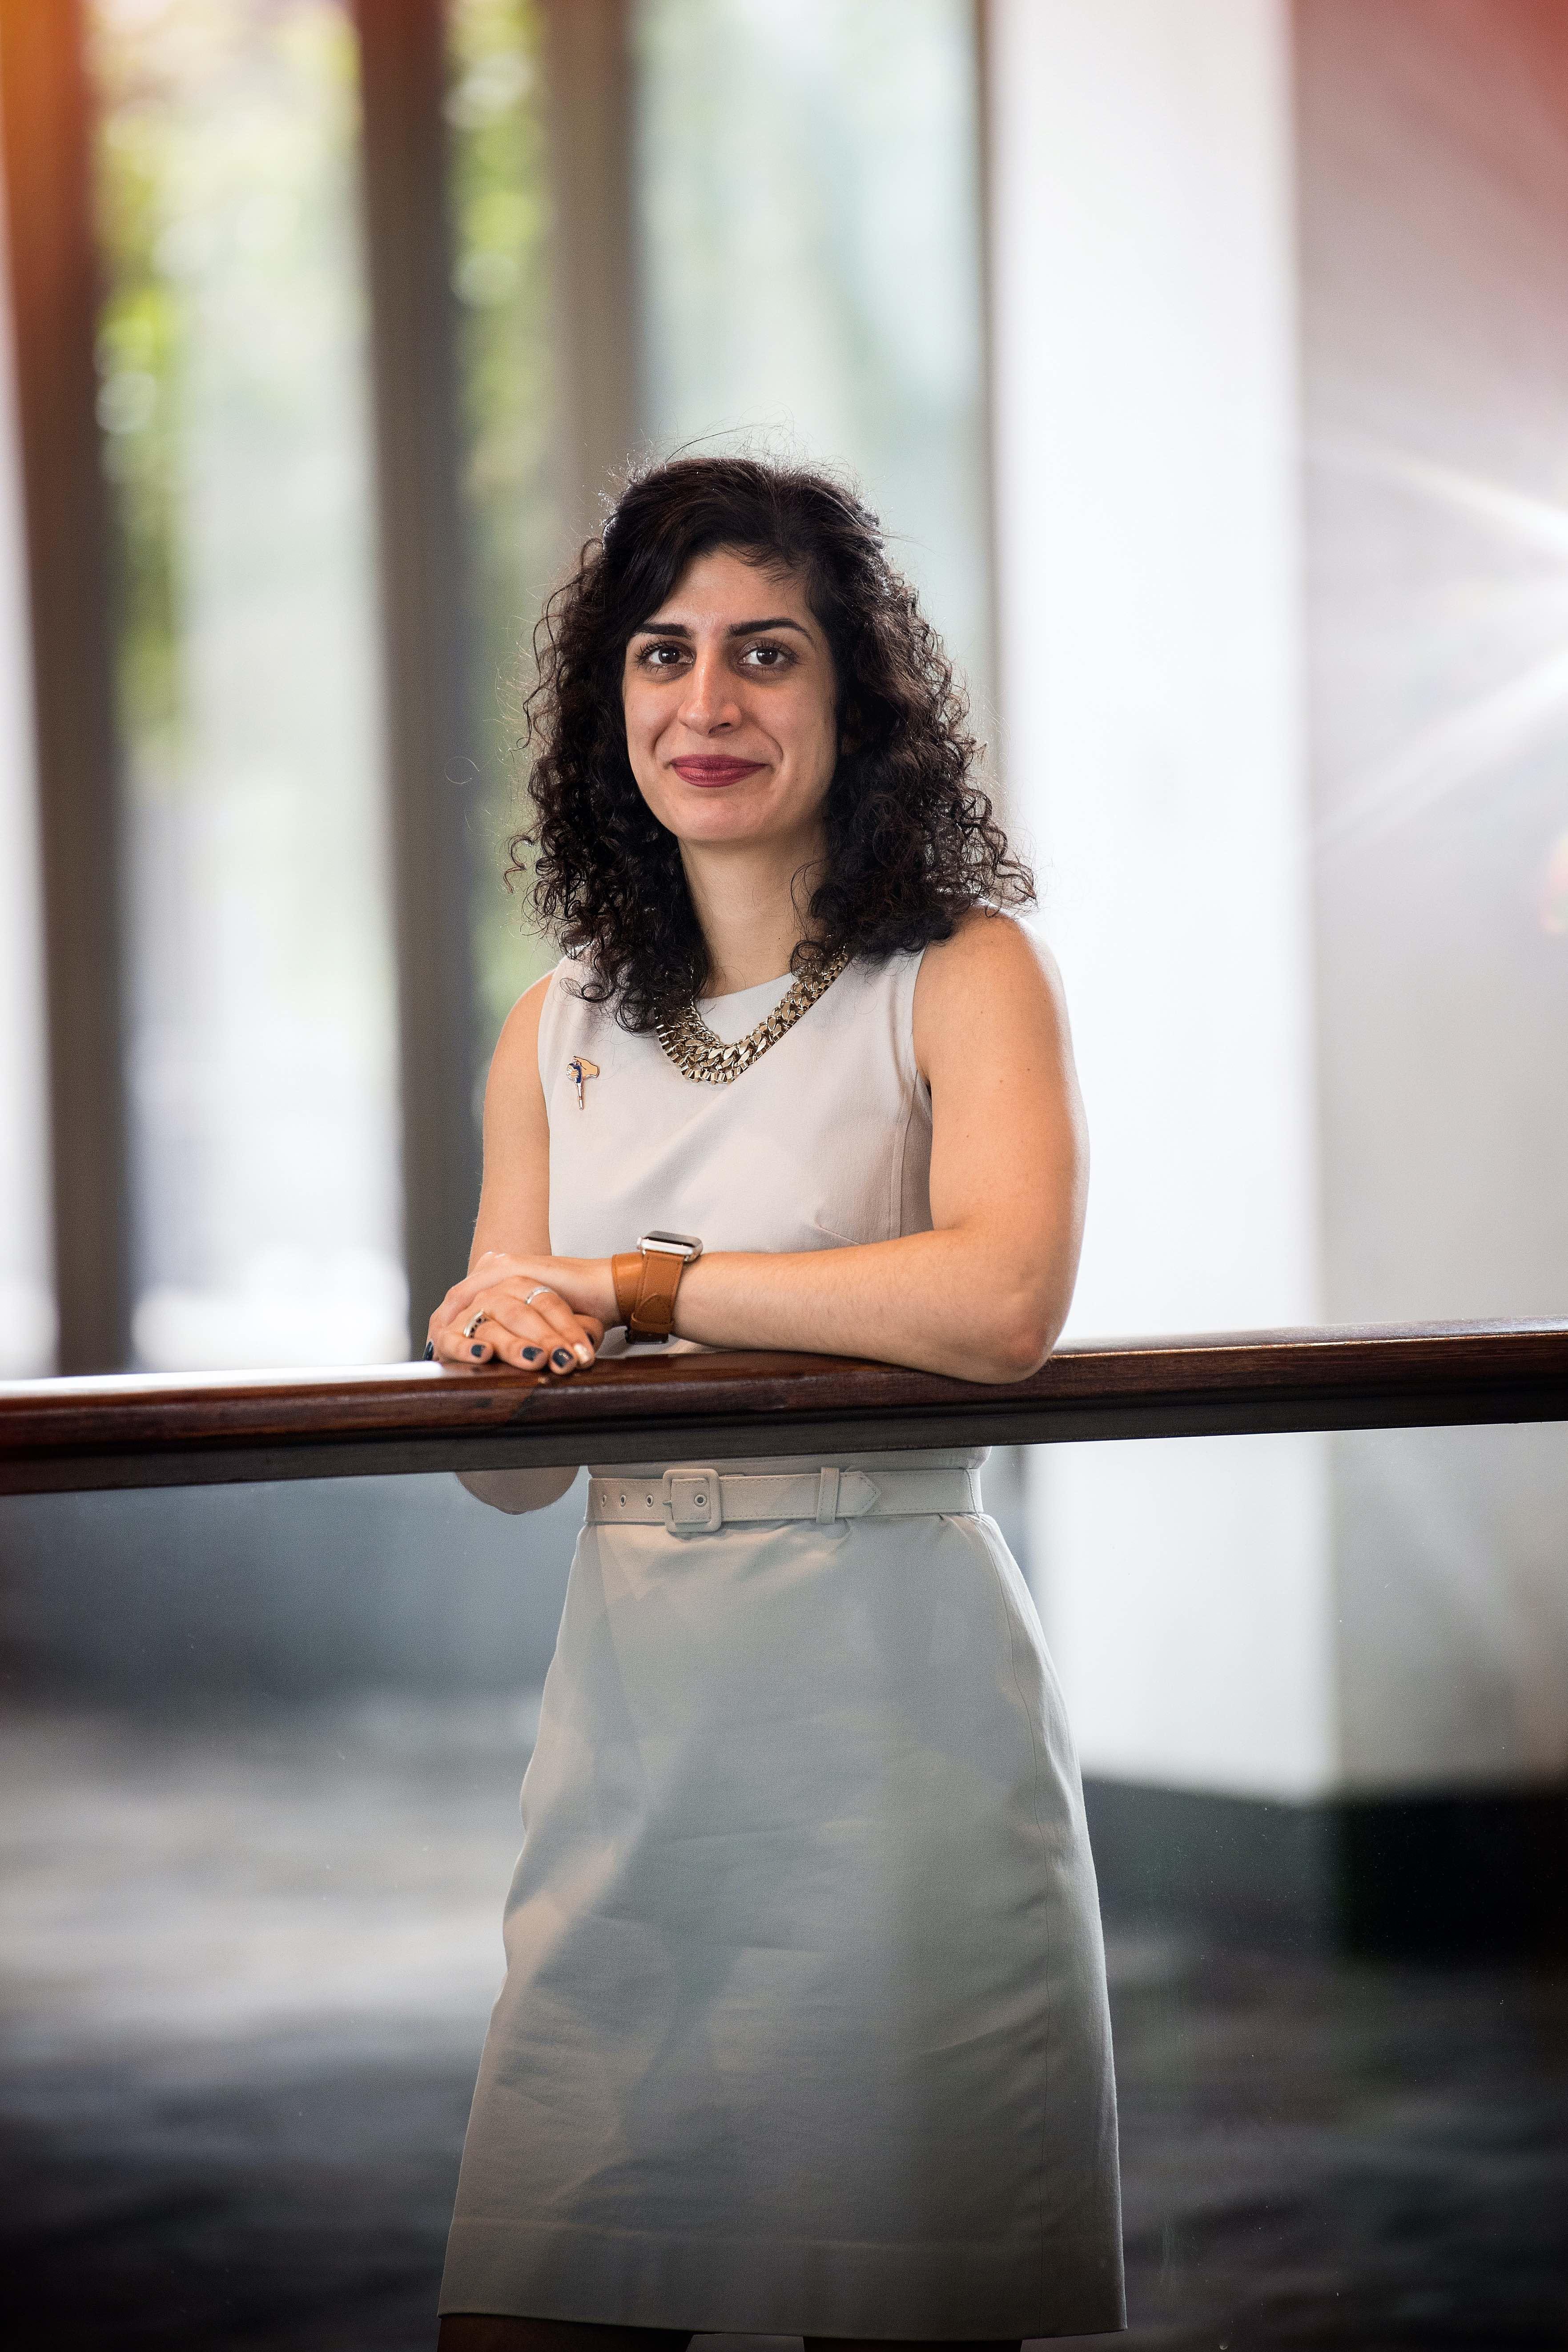 Maryam Zaringhalam, PhD